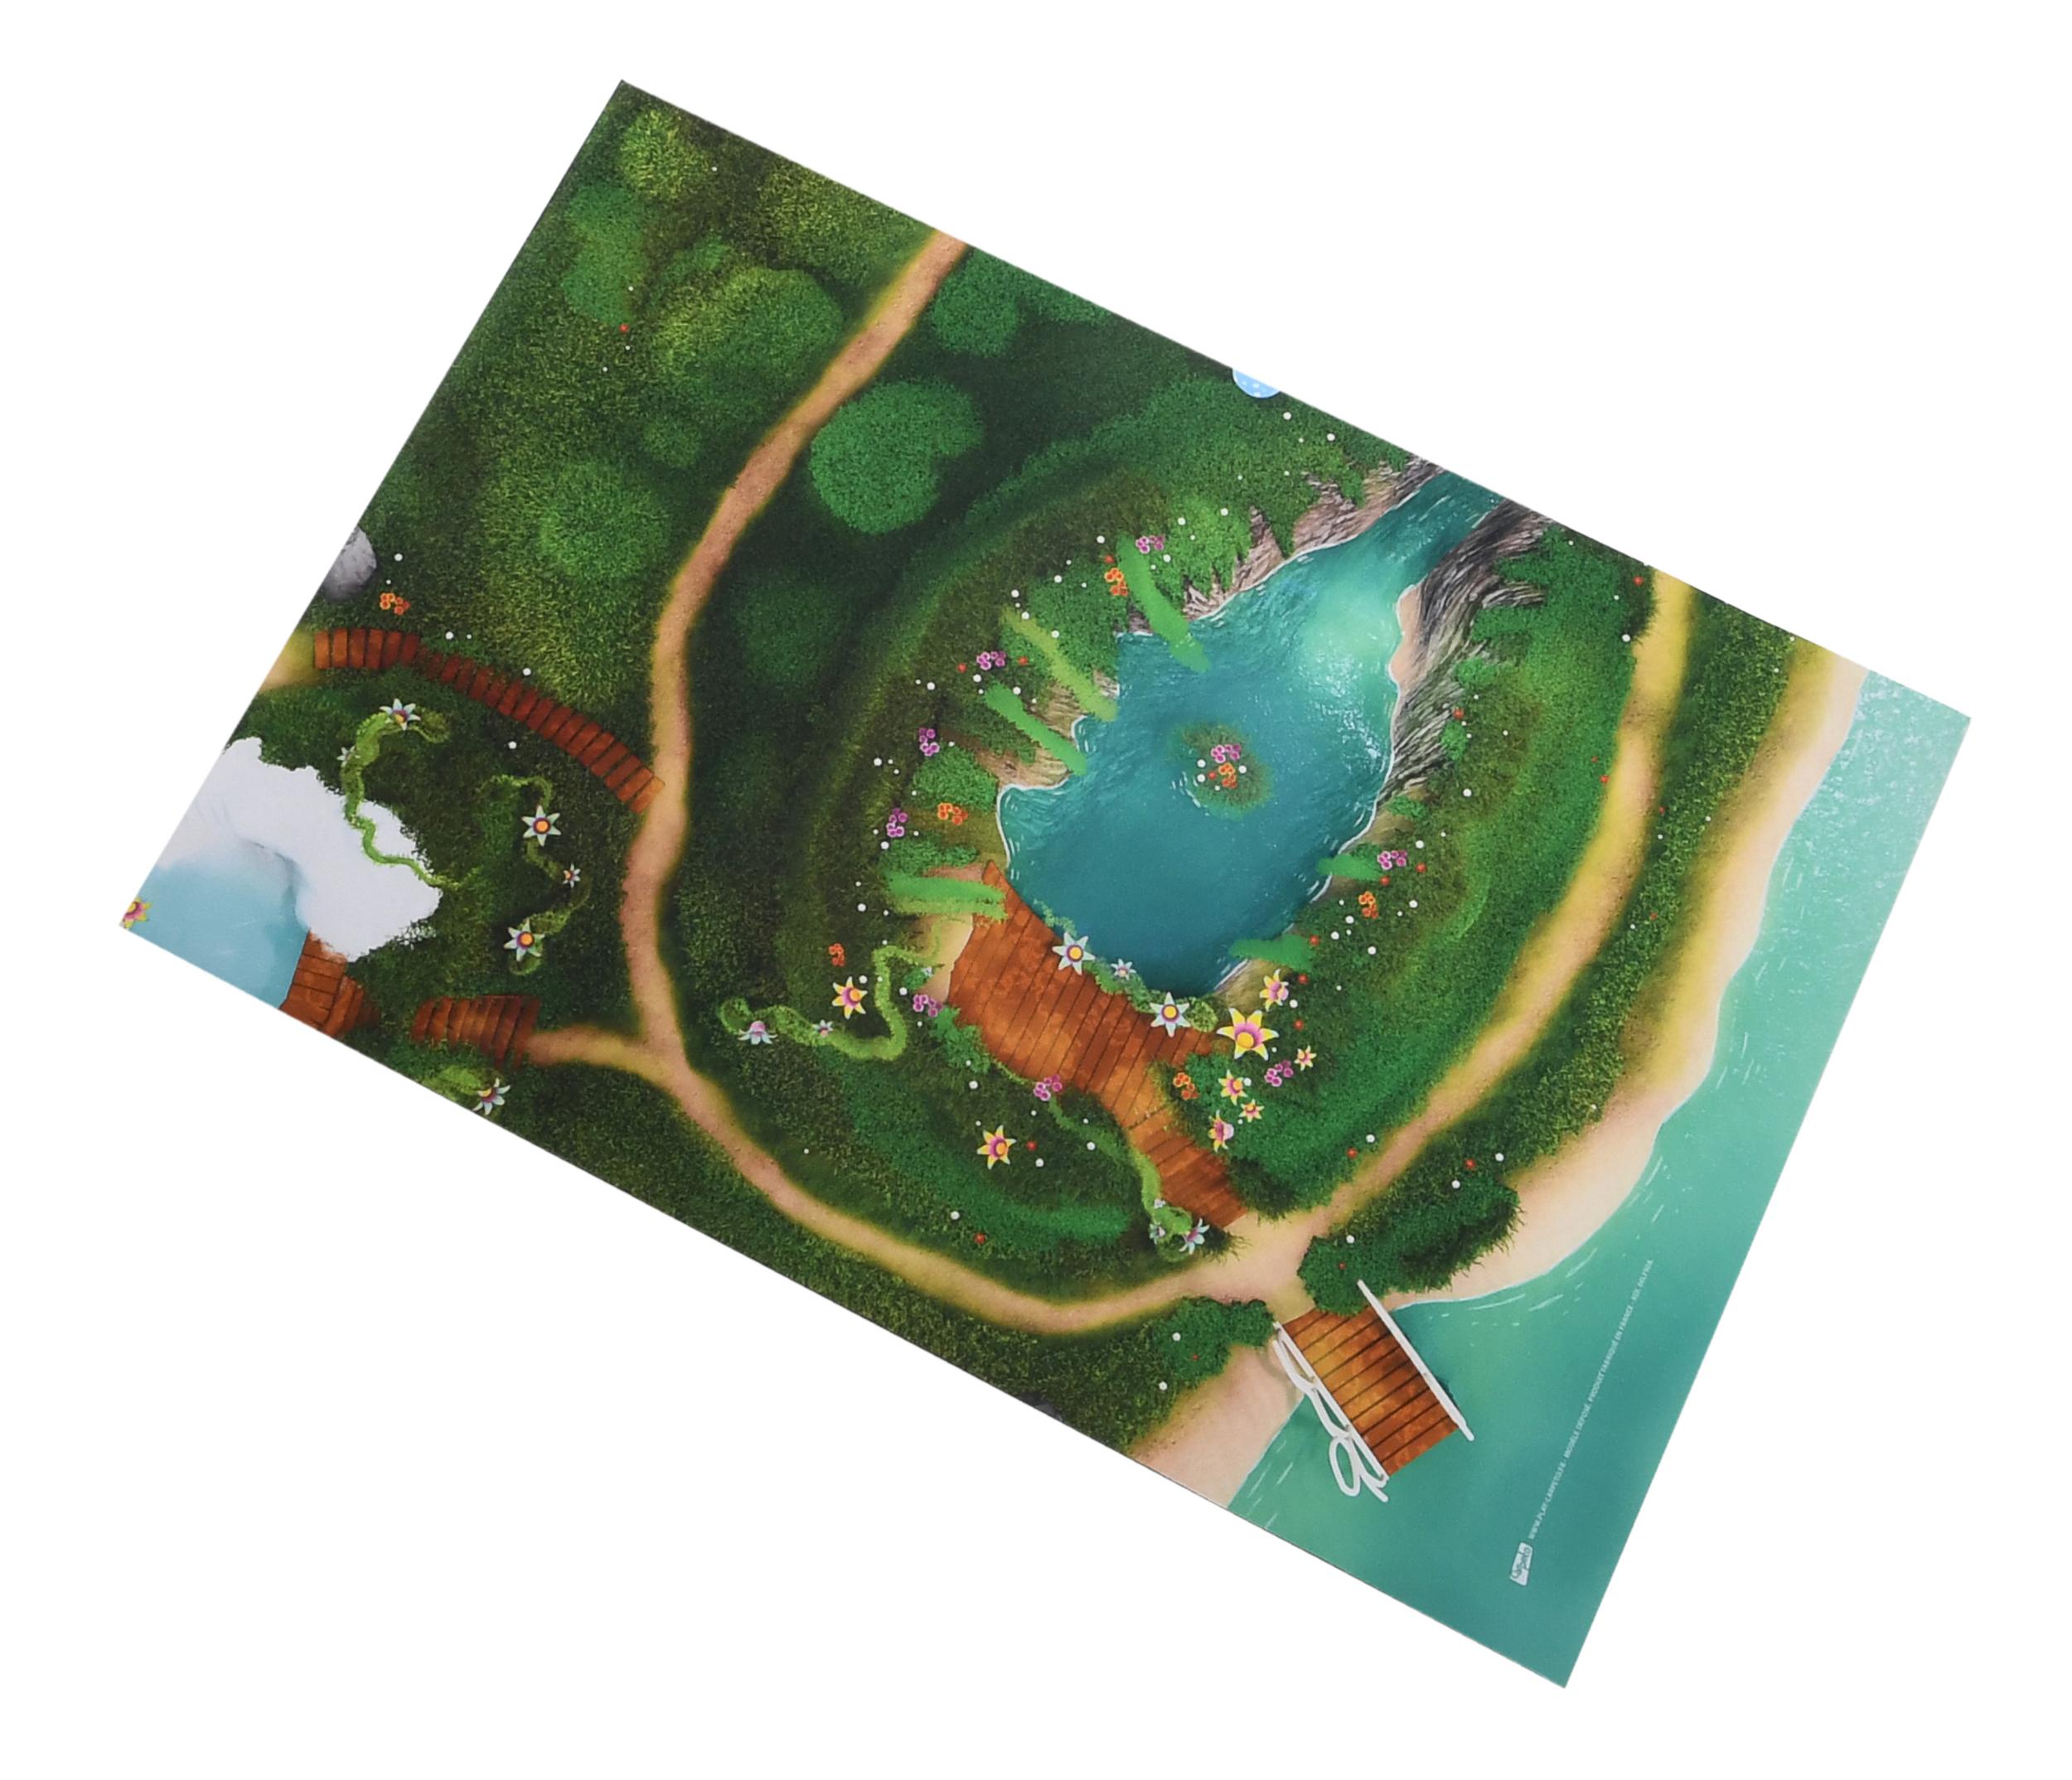 Klein Speelkleed Carpeto - Sprookjes Lagune 90 x 60cm